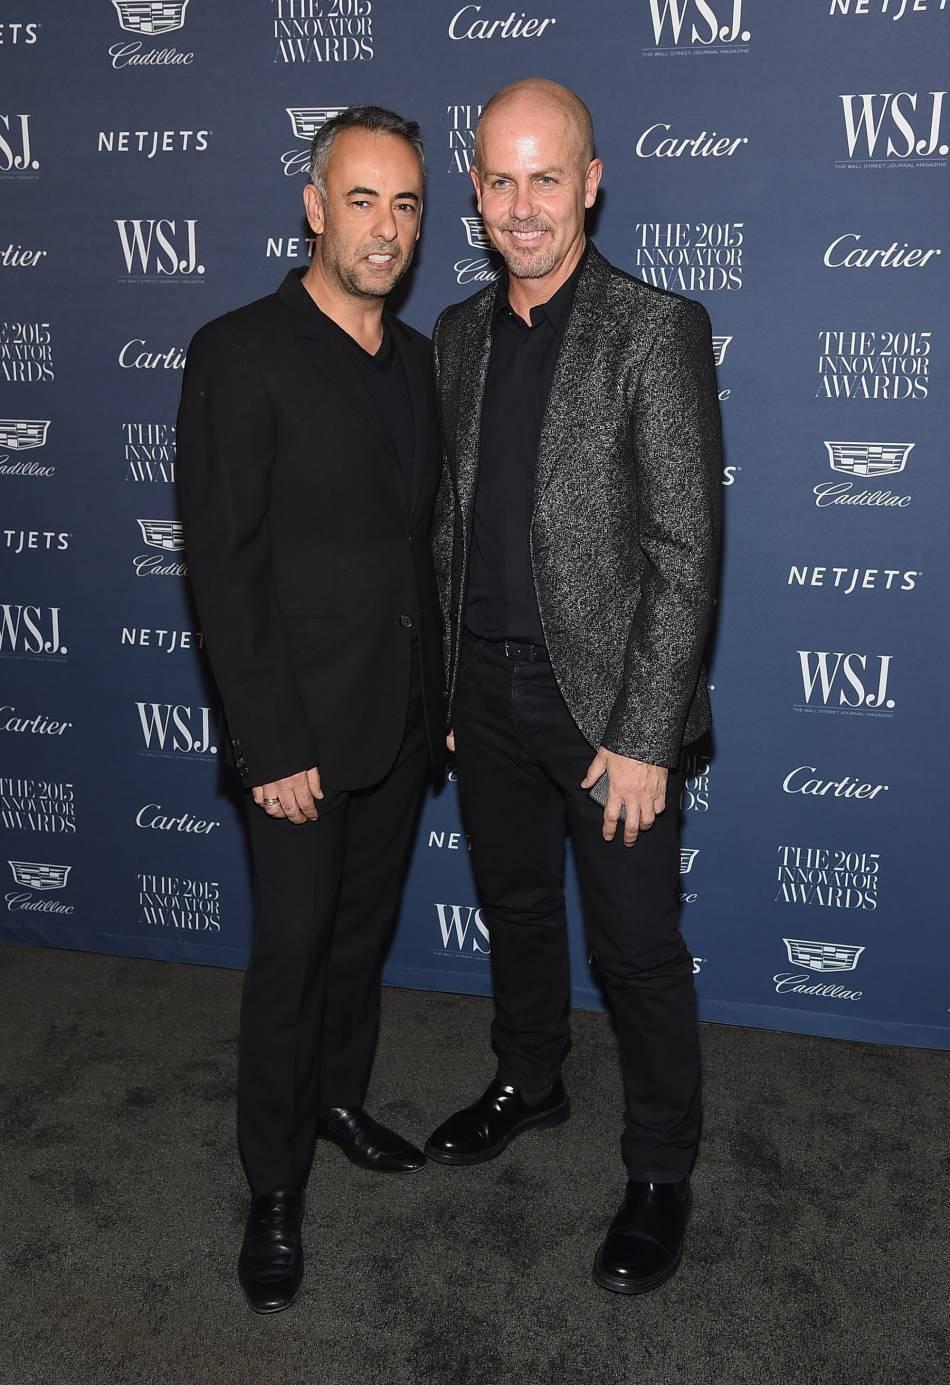 Francisco Costa et Italo Zucchelli quittent la maison Calvin Klein.